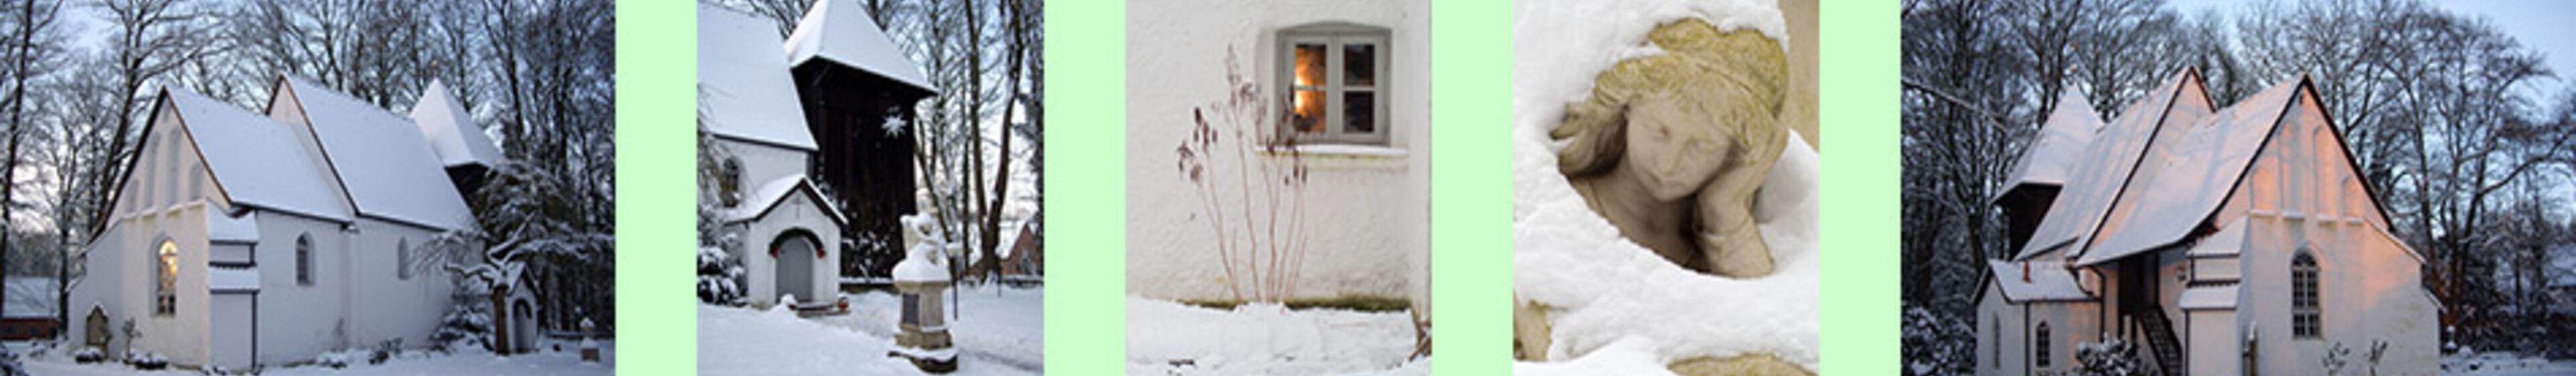 Winter_2015_3